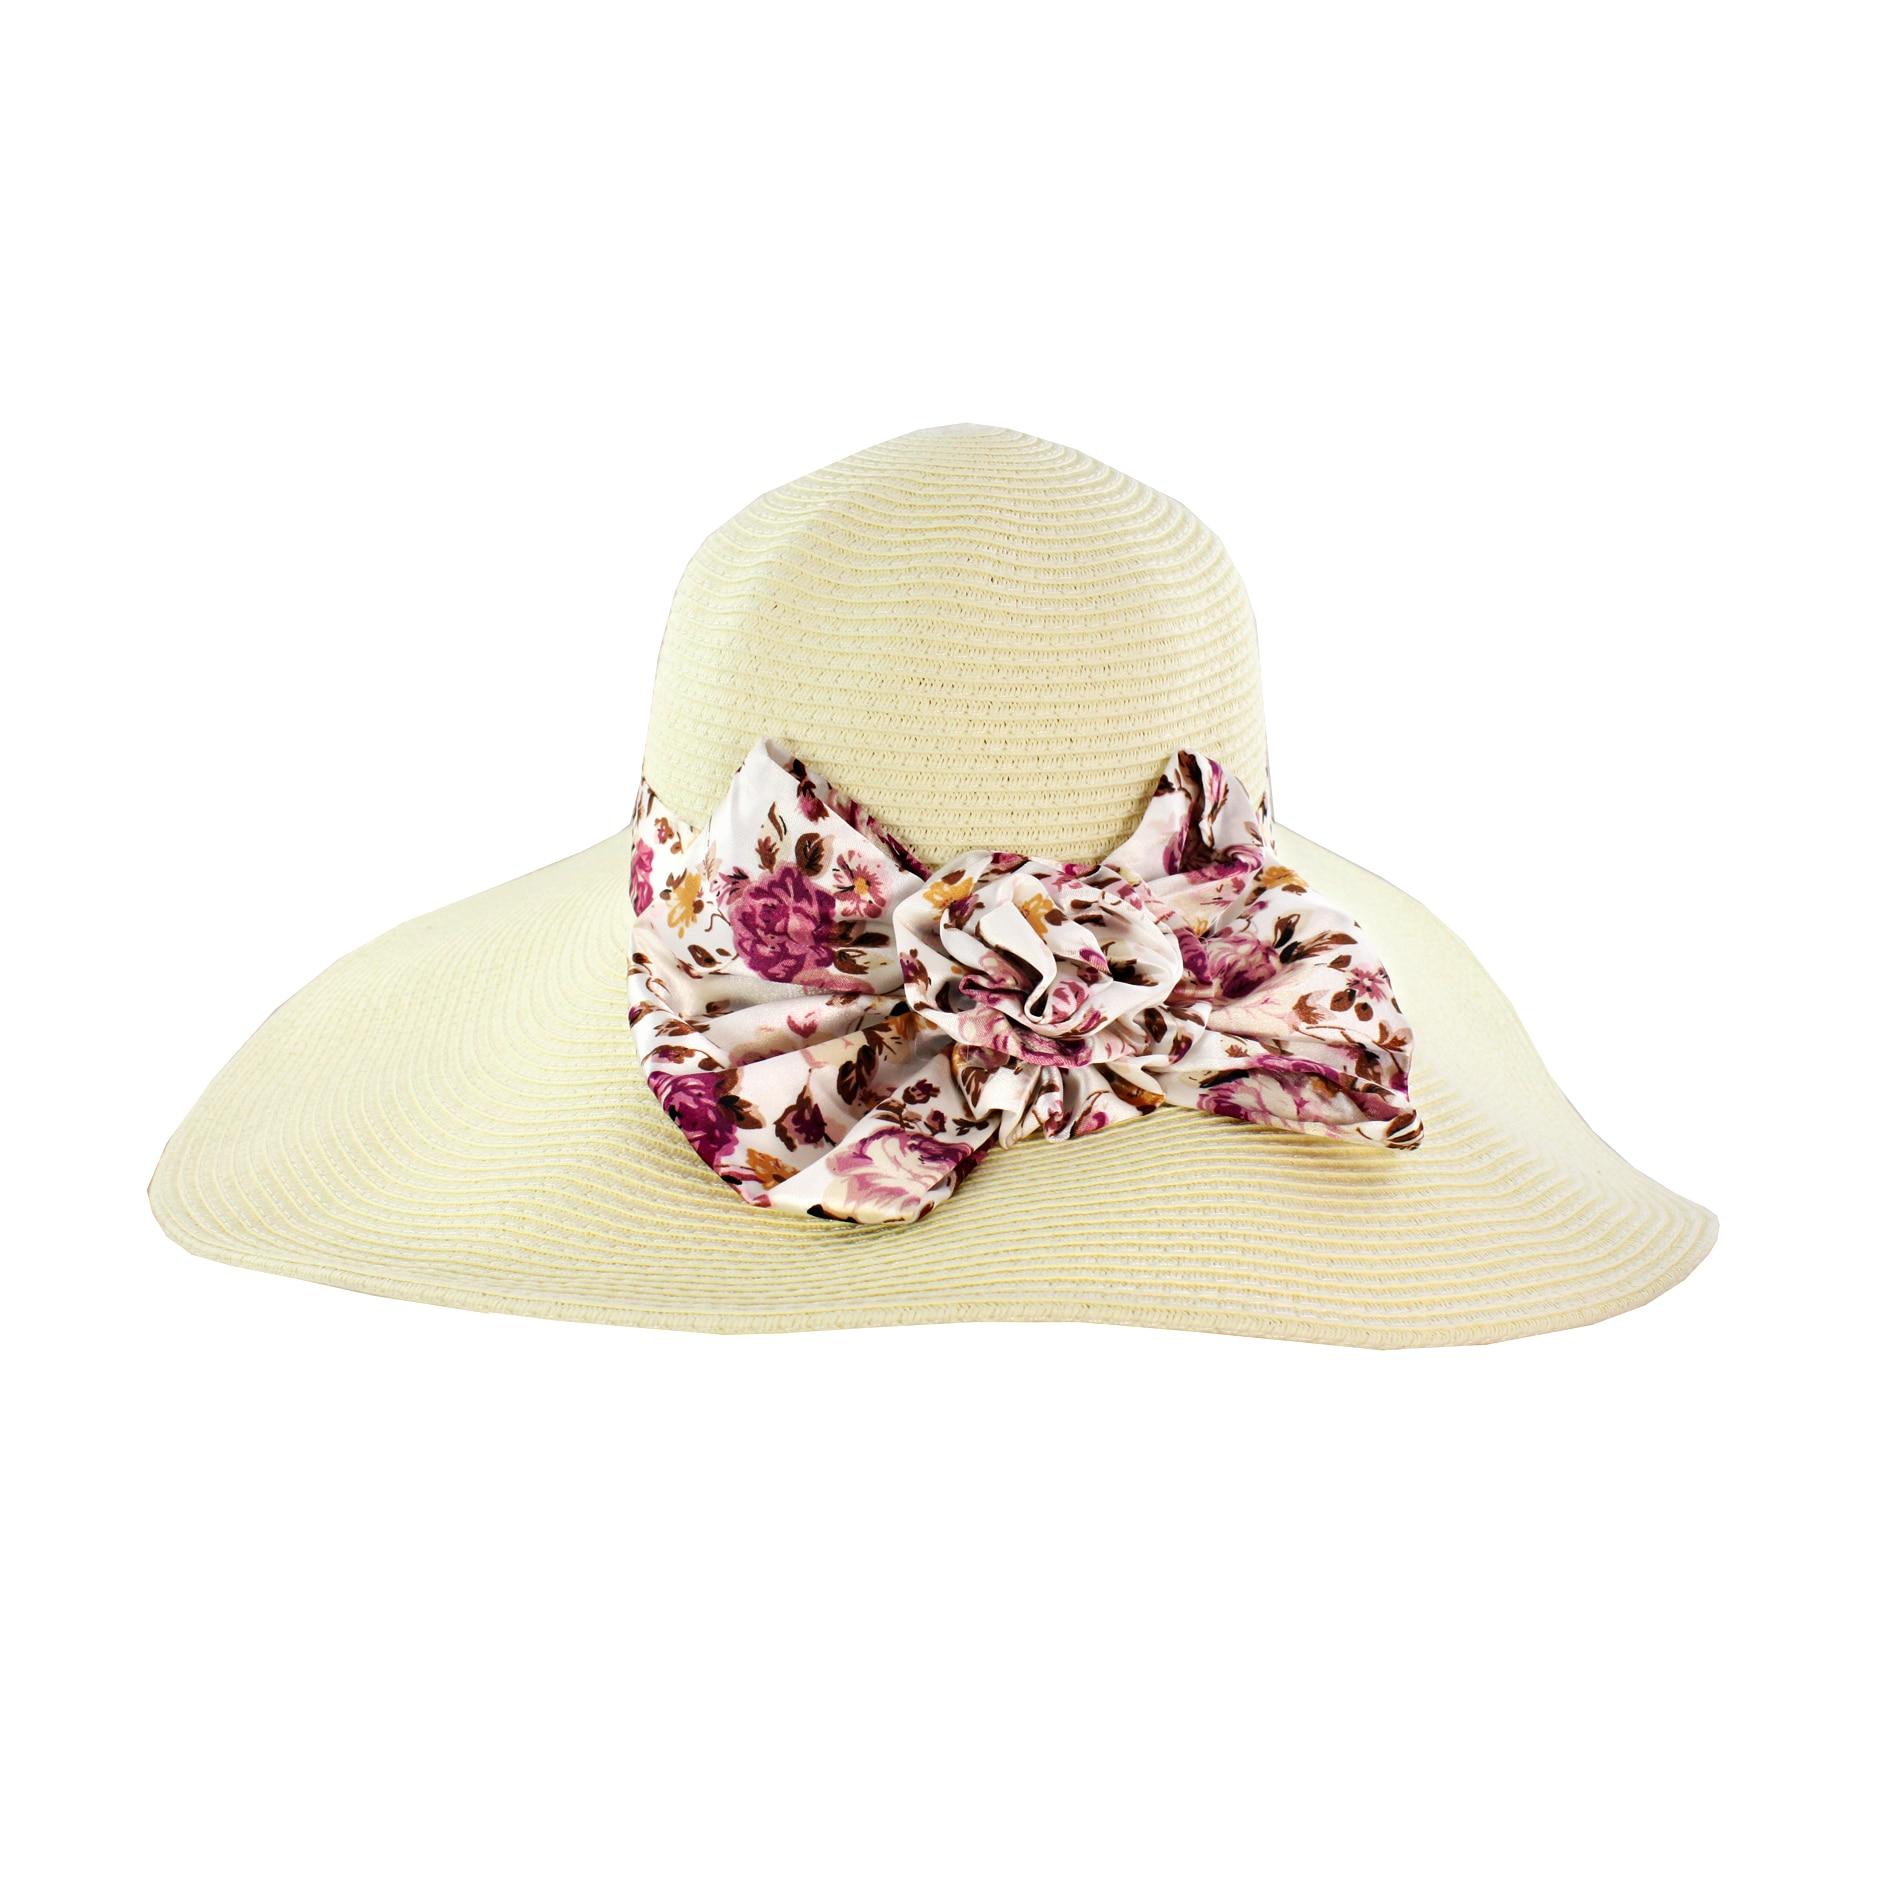 Faddism Women's Beige Ribbon Straw Sun Hat